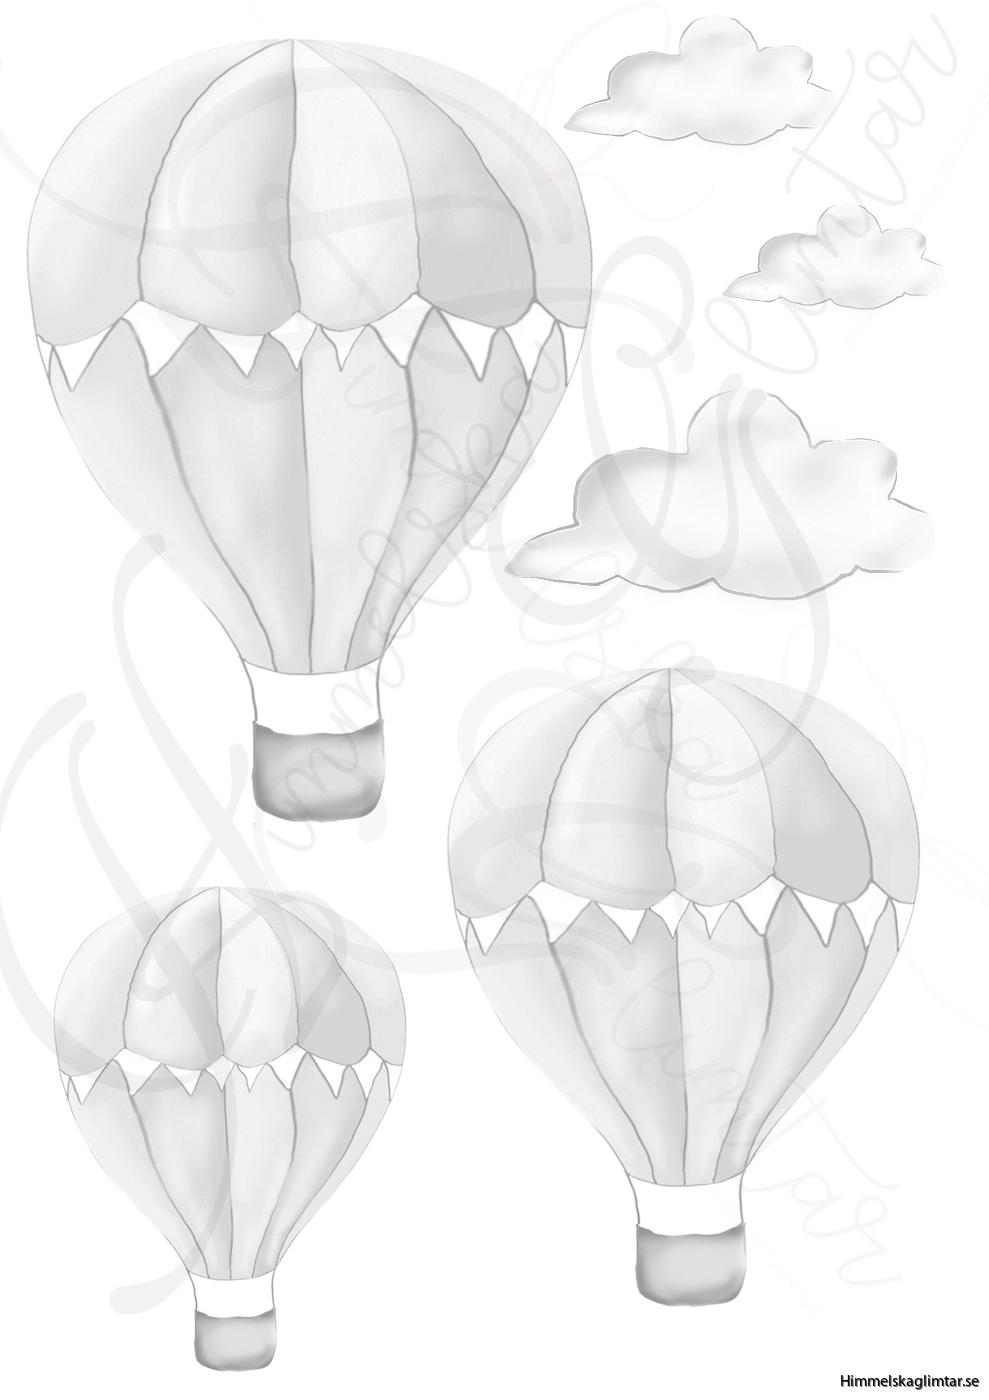 väggdecorluftballongbeigehg